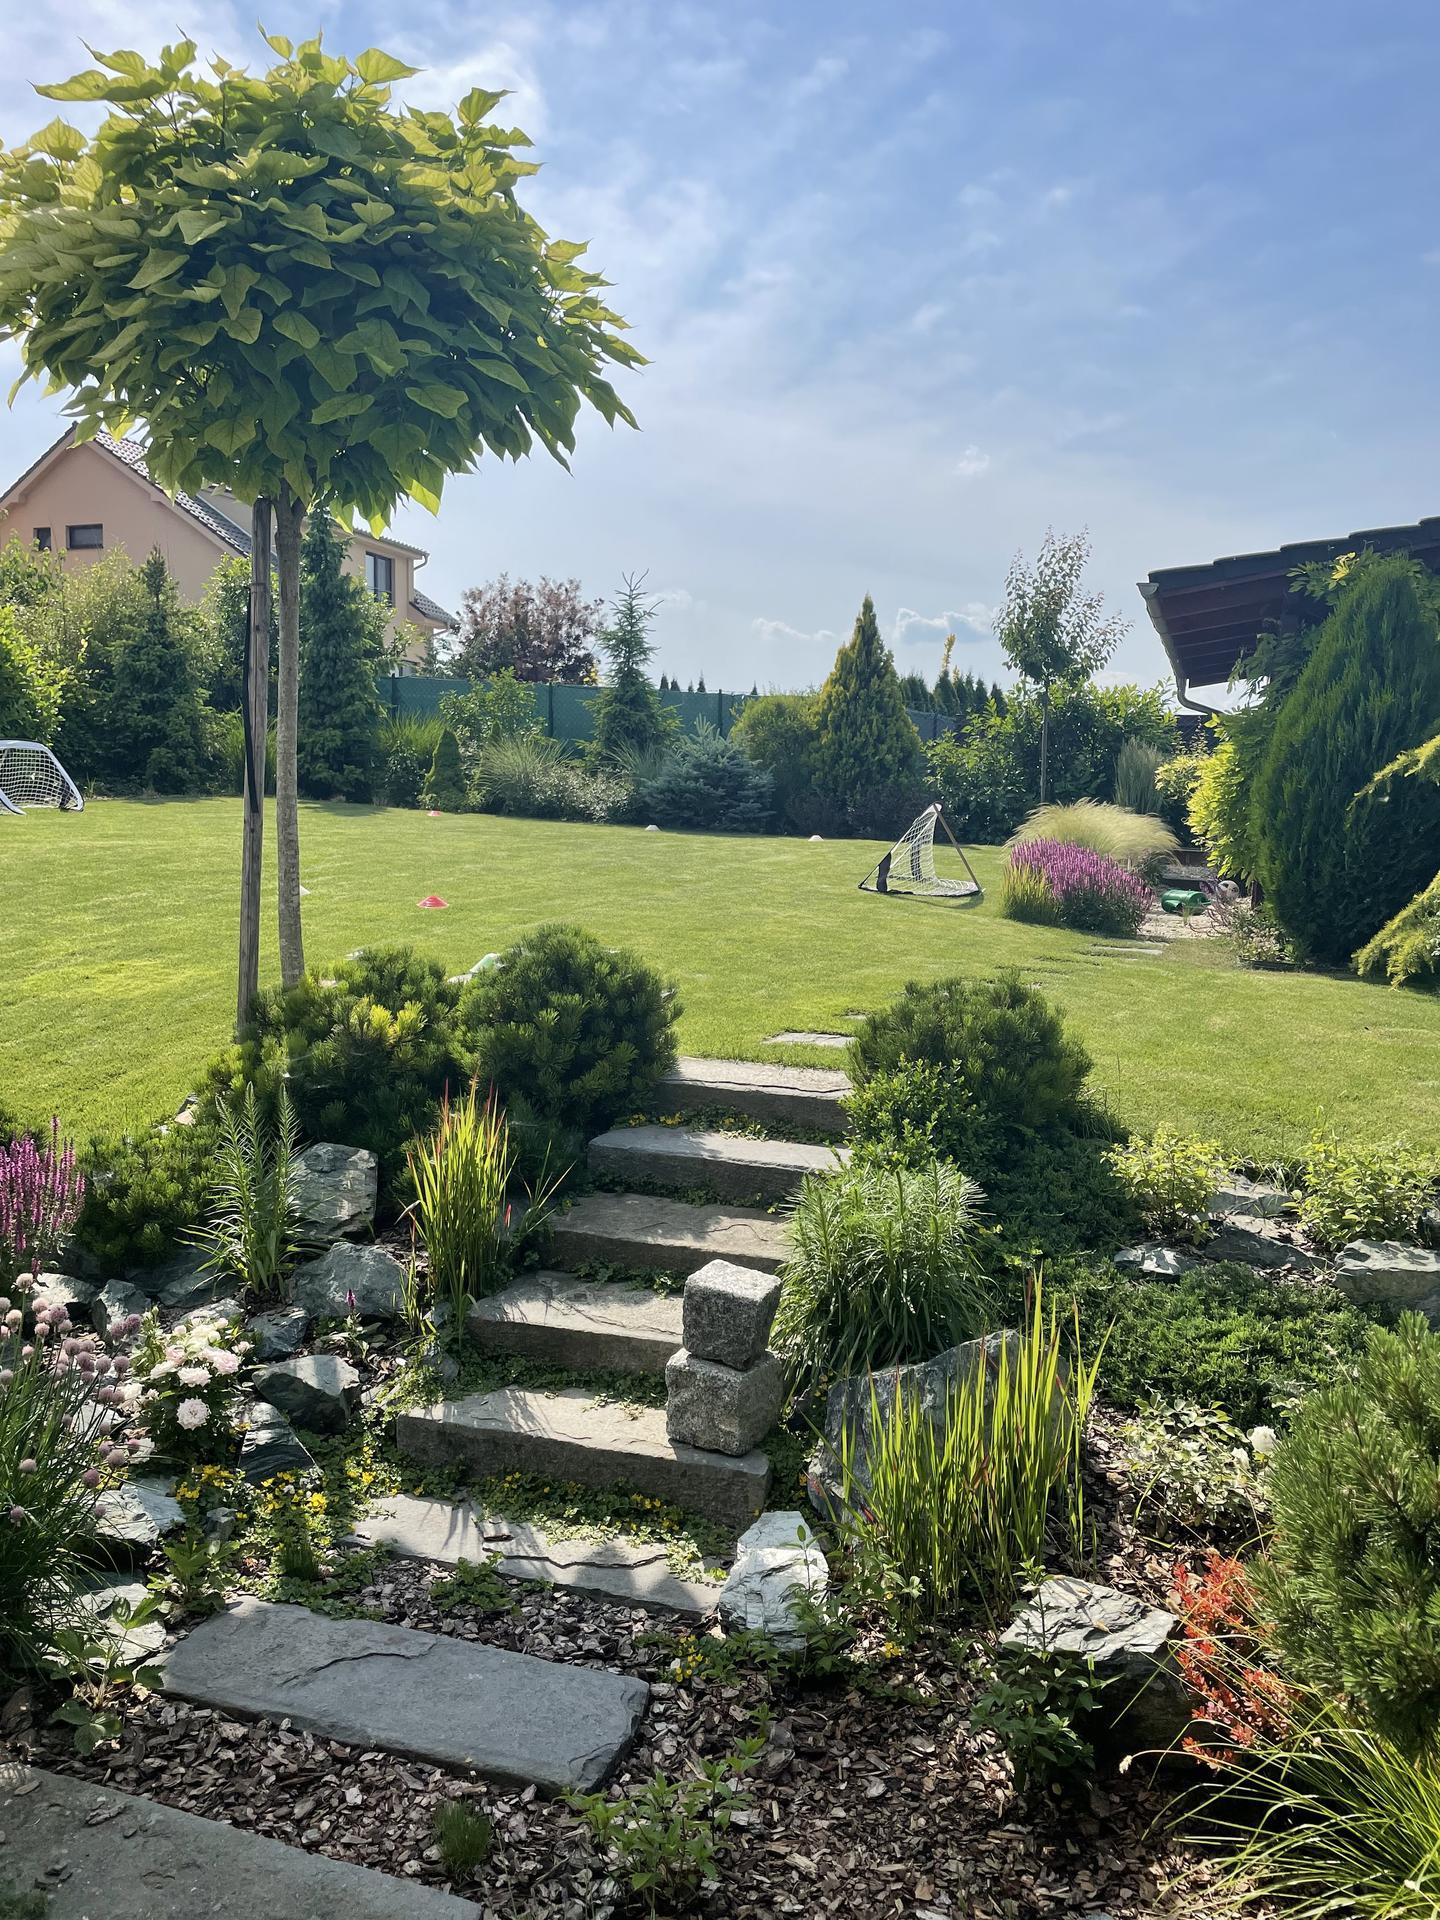 Zahrada 2021 - Obrázek č. 25